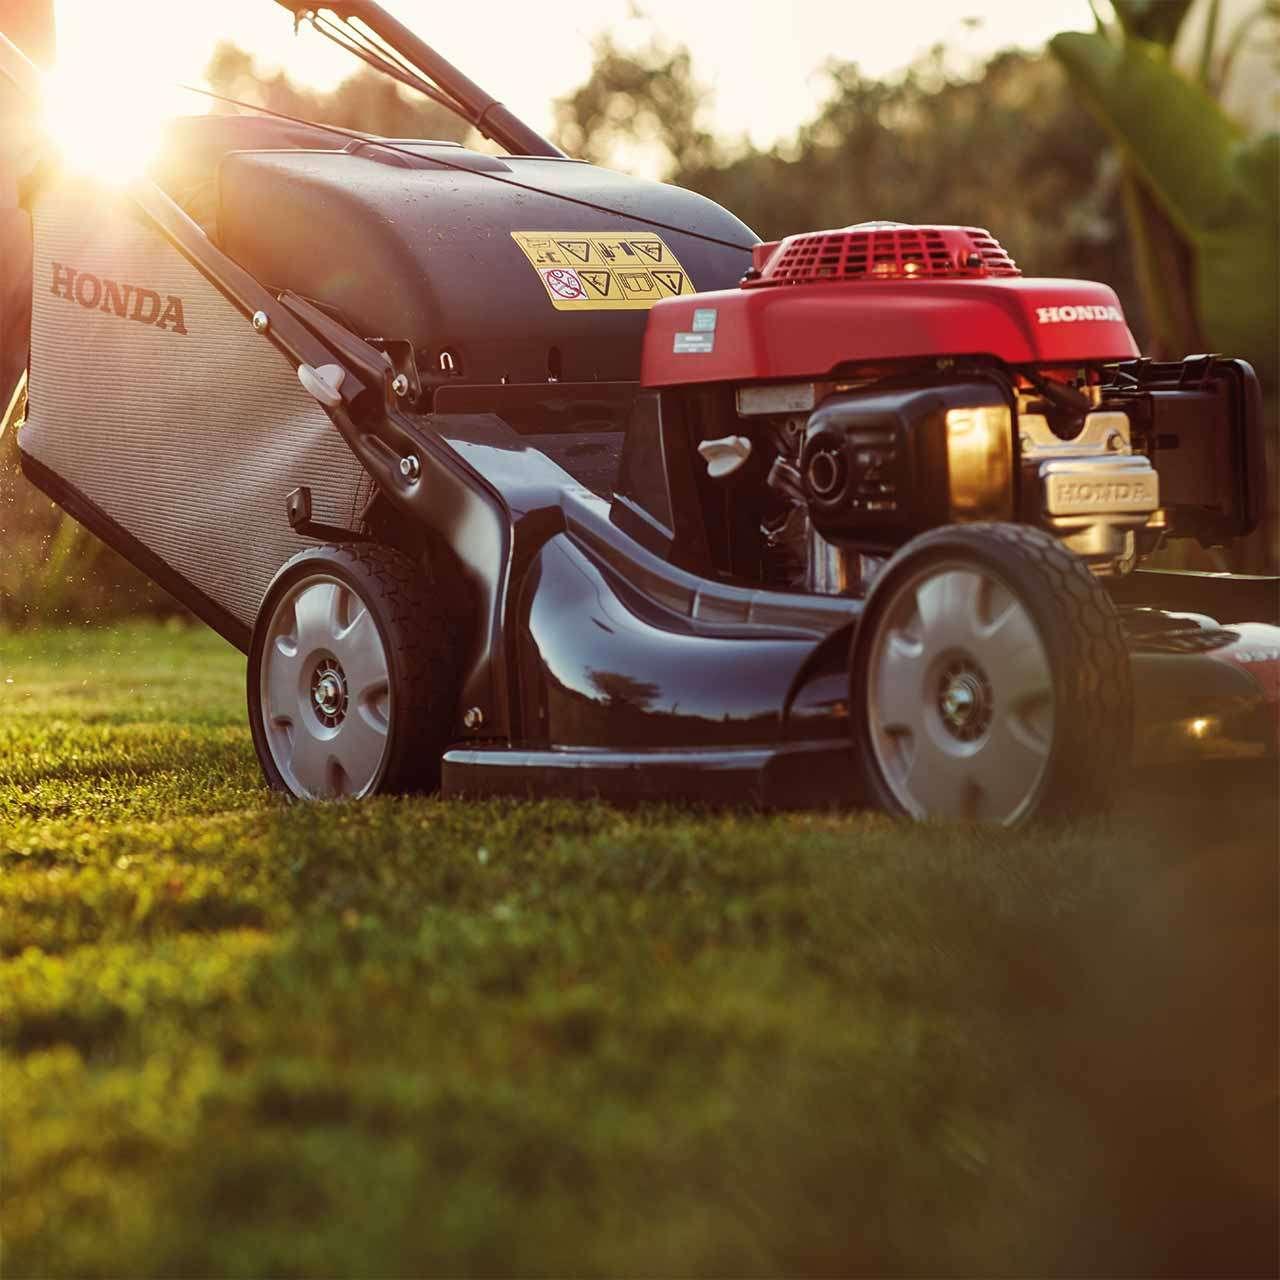 Honda HRX Voiceover